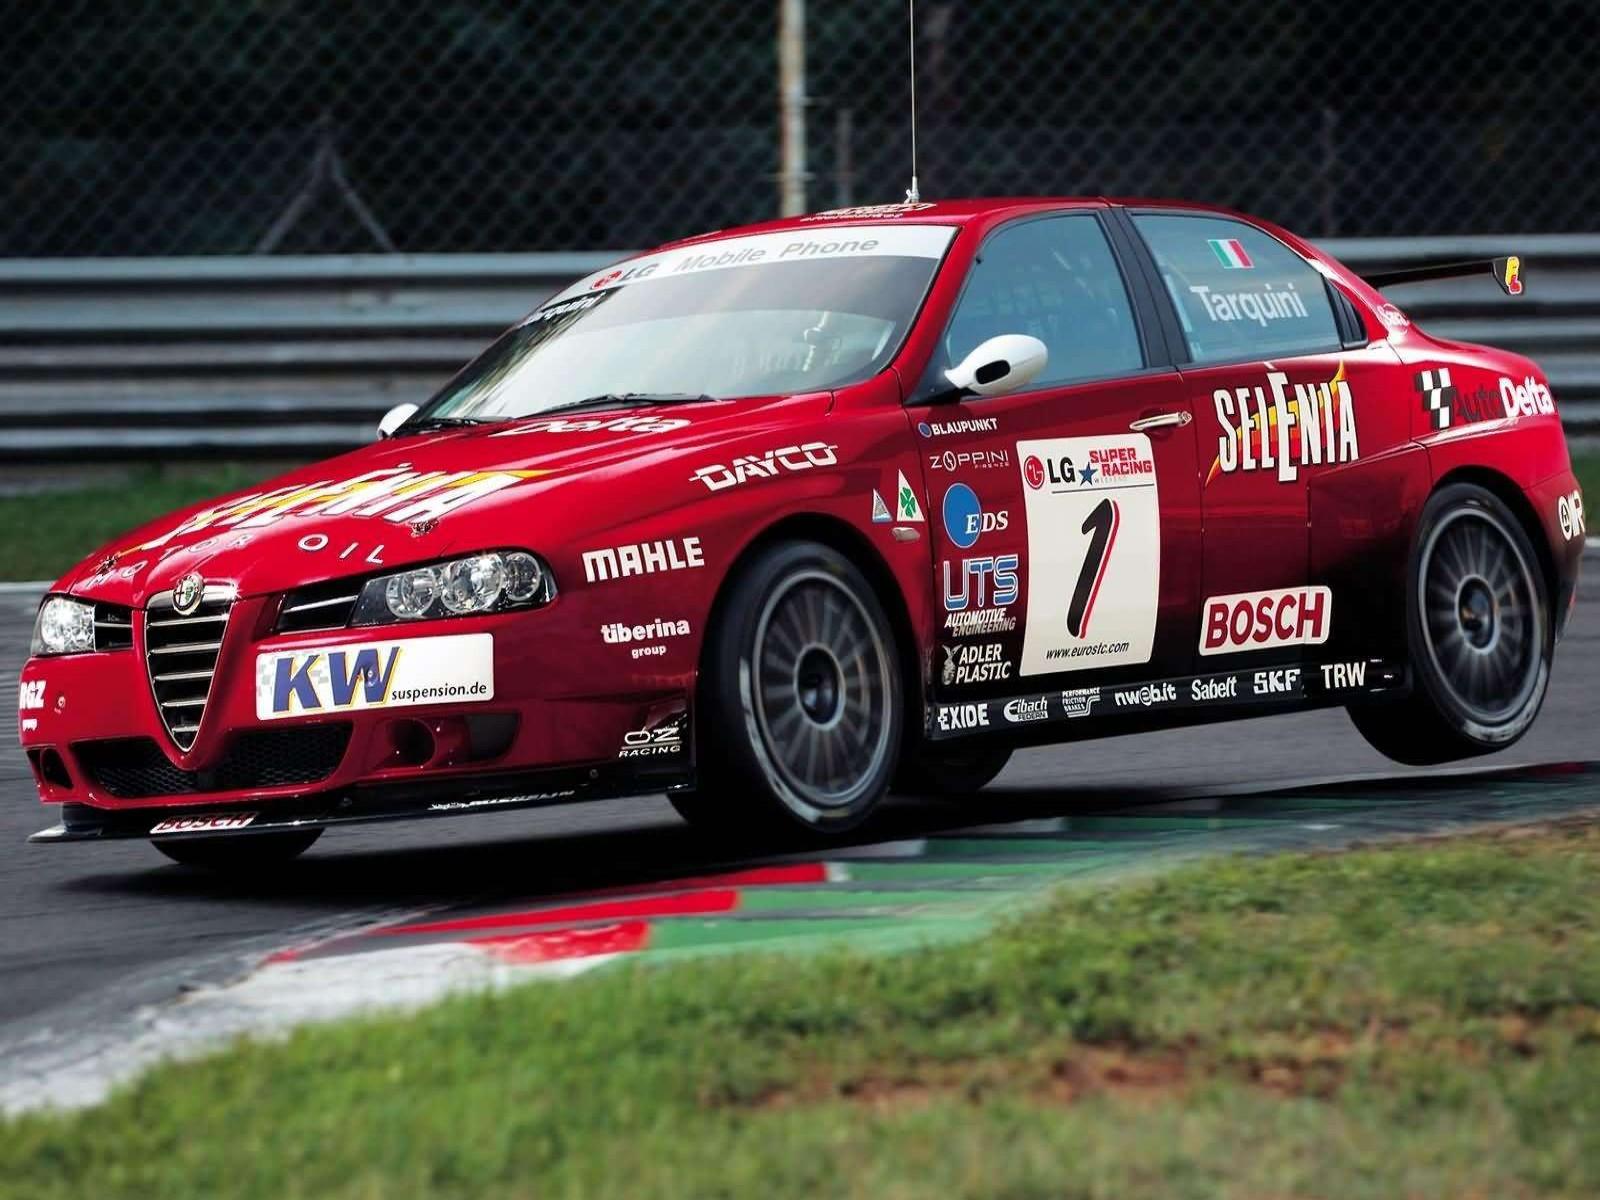 Alfa Romeo 156 Gta Autodelta 2004